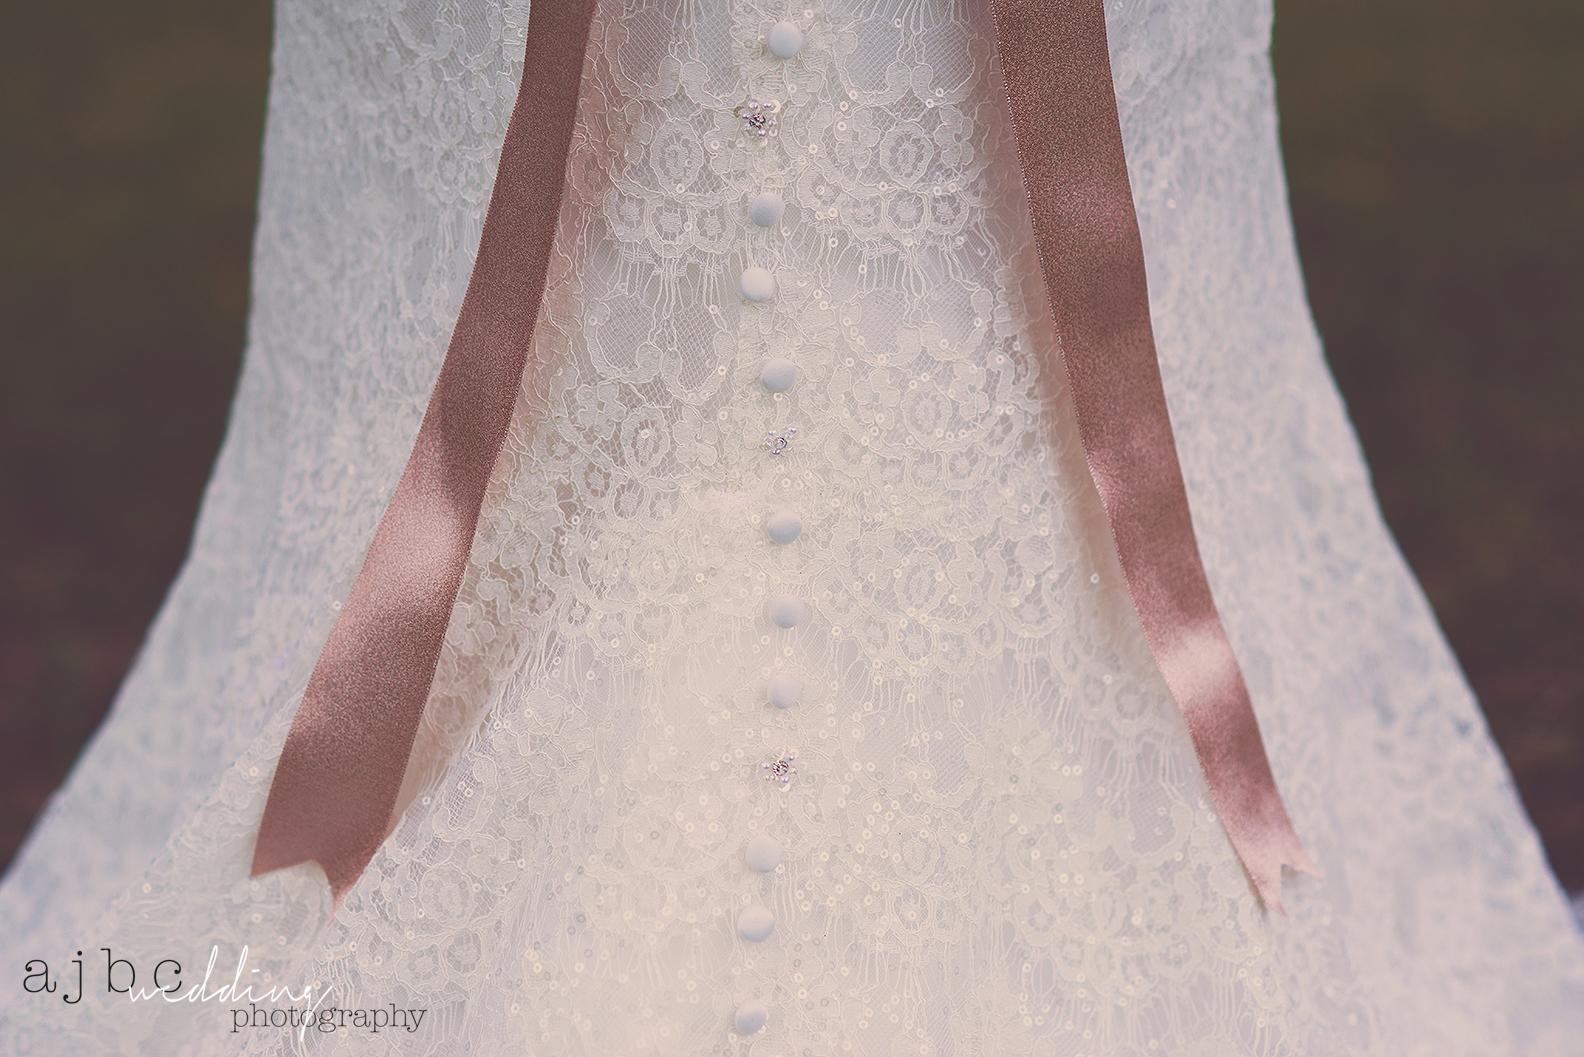 crystals ajbcphotography-port-huron-michigan-wedding-photographer-outdoors-summer-wedding-country-wedding-wadhams-michigan-bride-vintage-wedding-dress-shots-getting-ready.jpg